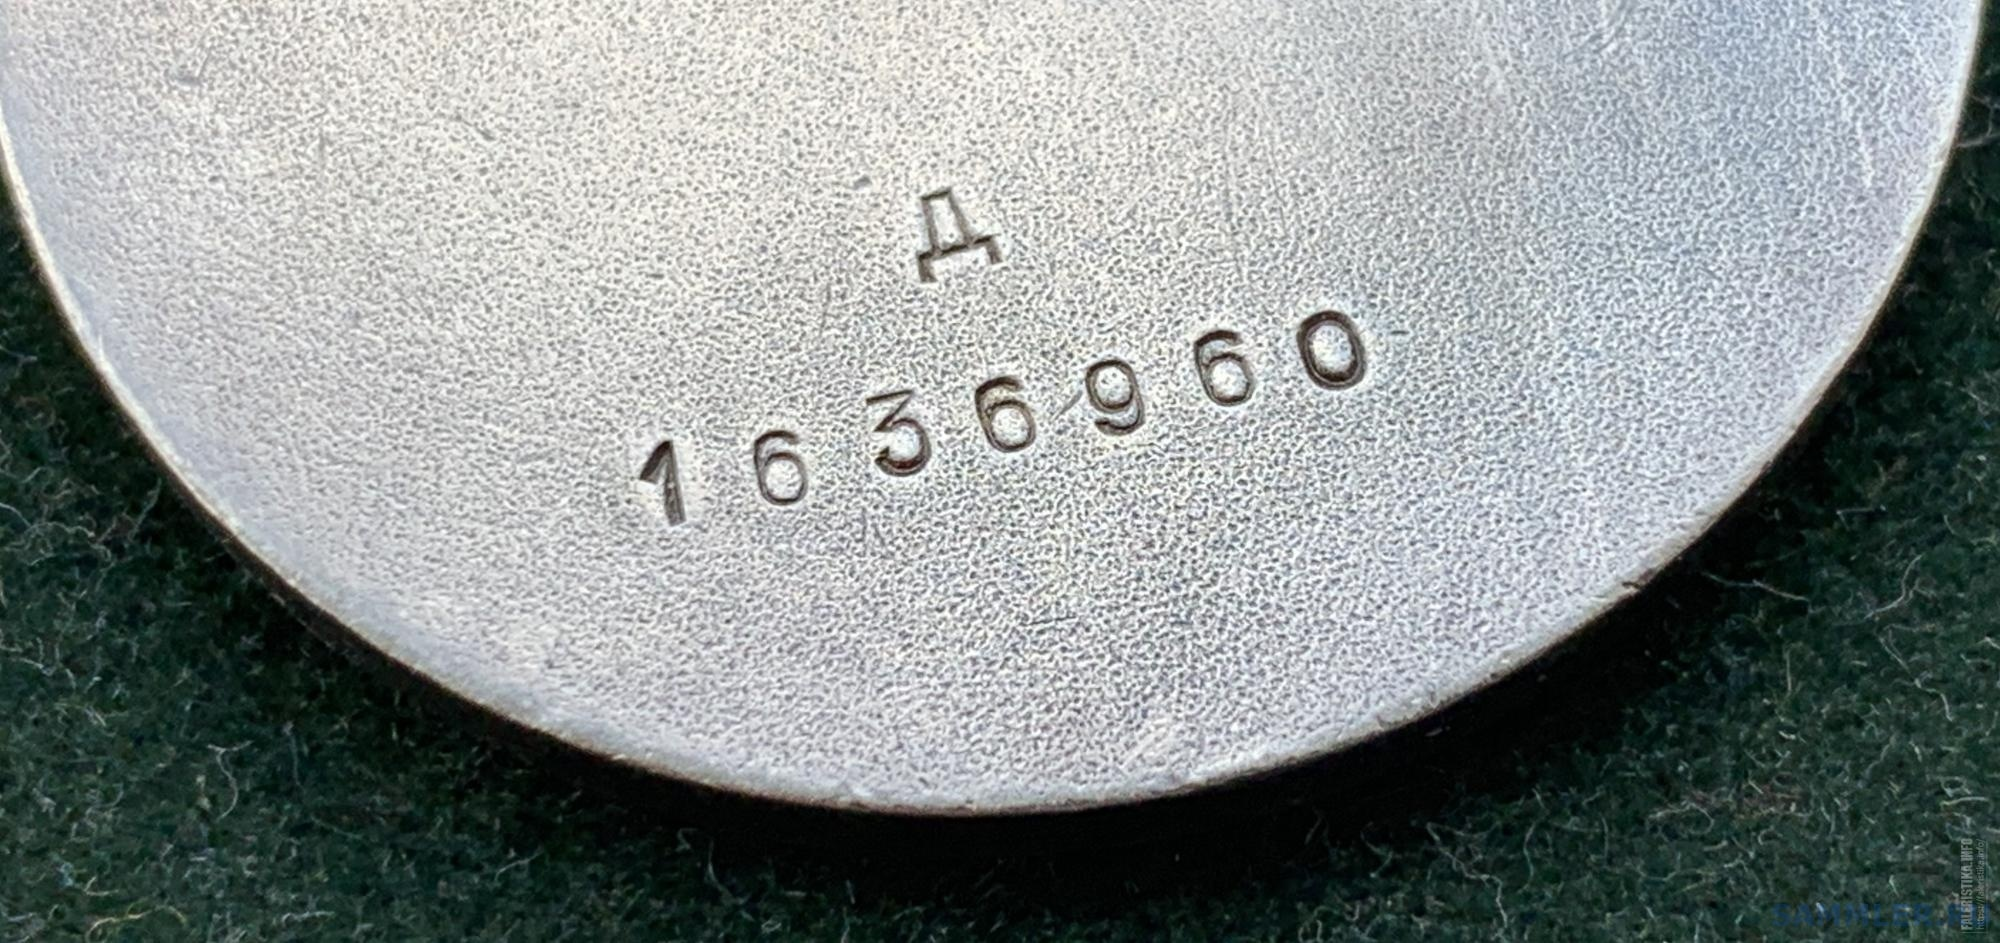 B016D899-1262-41E2-B2D1-58DB7B089C99.jpg